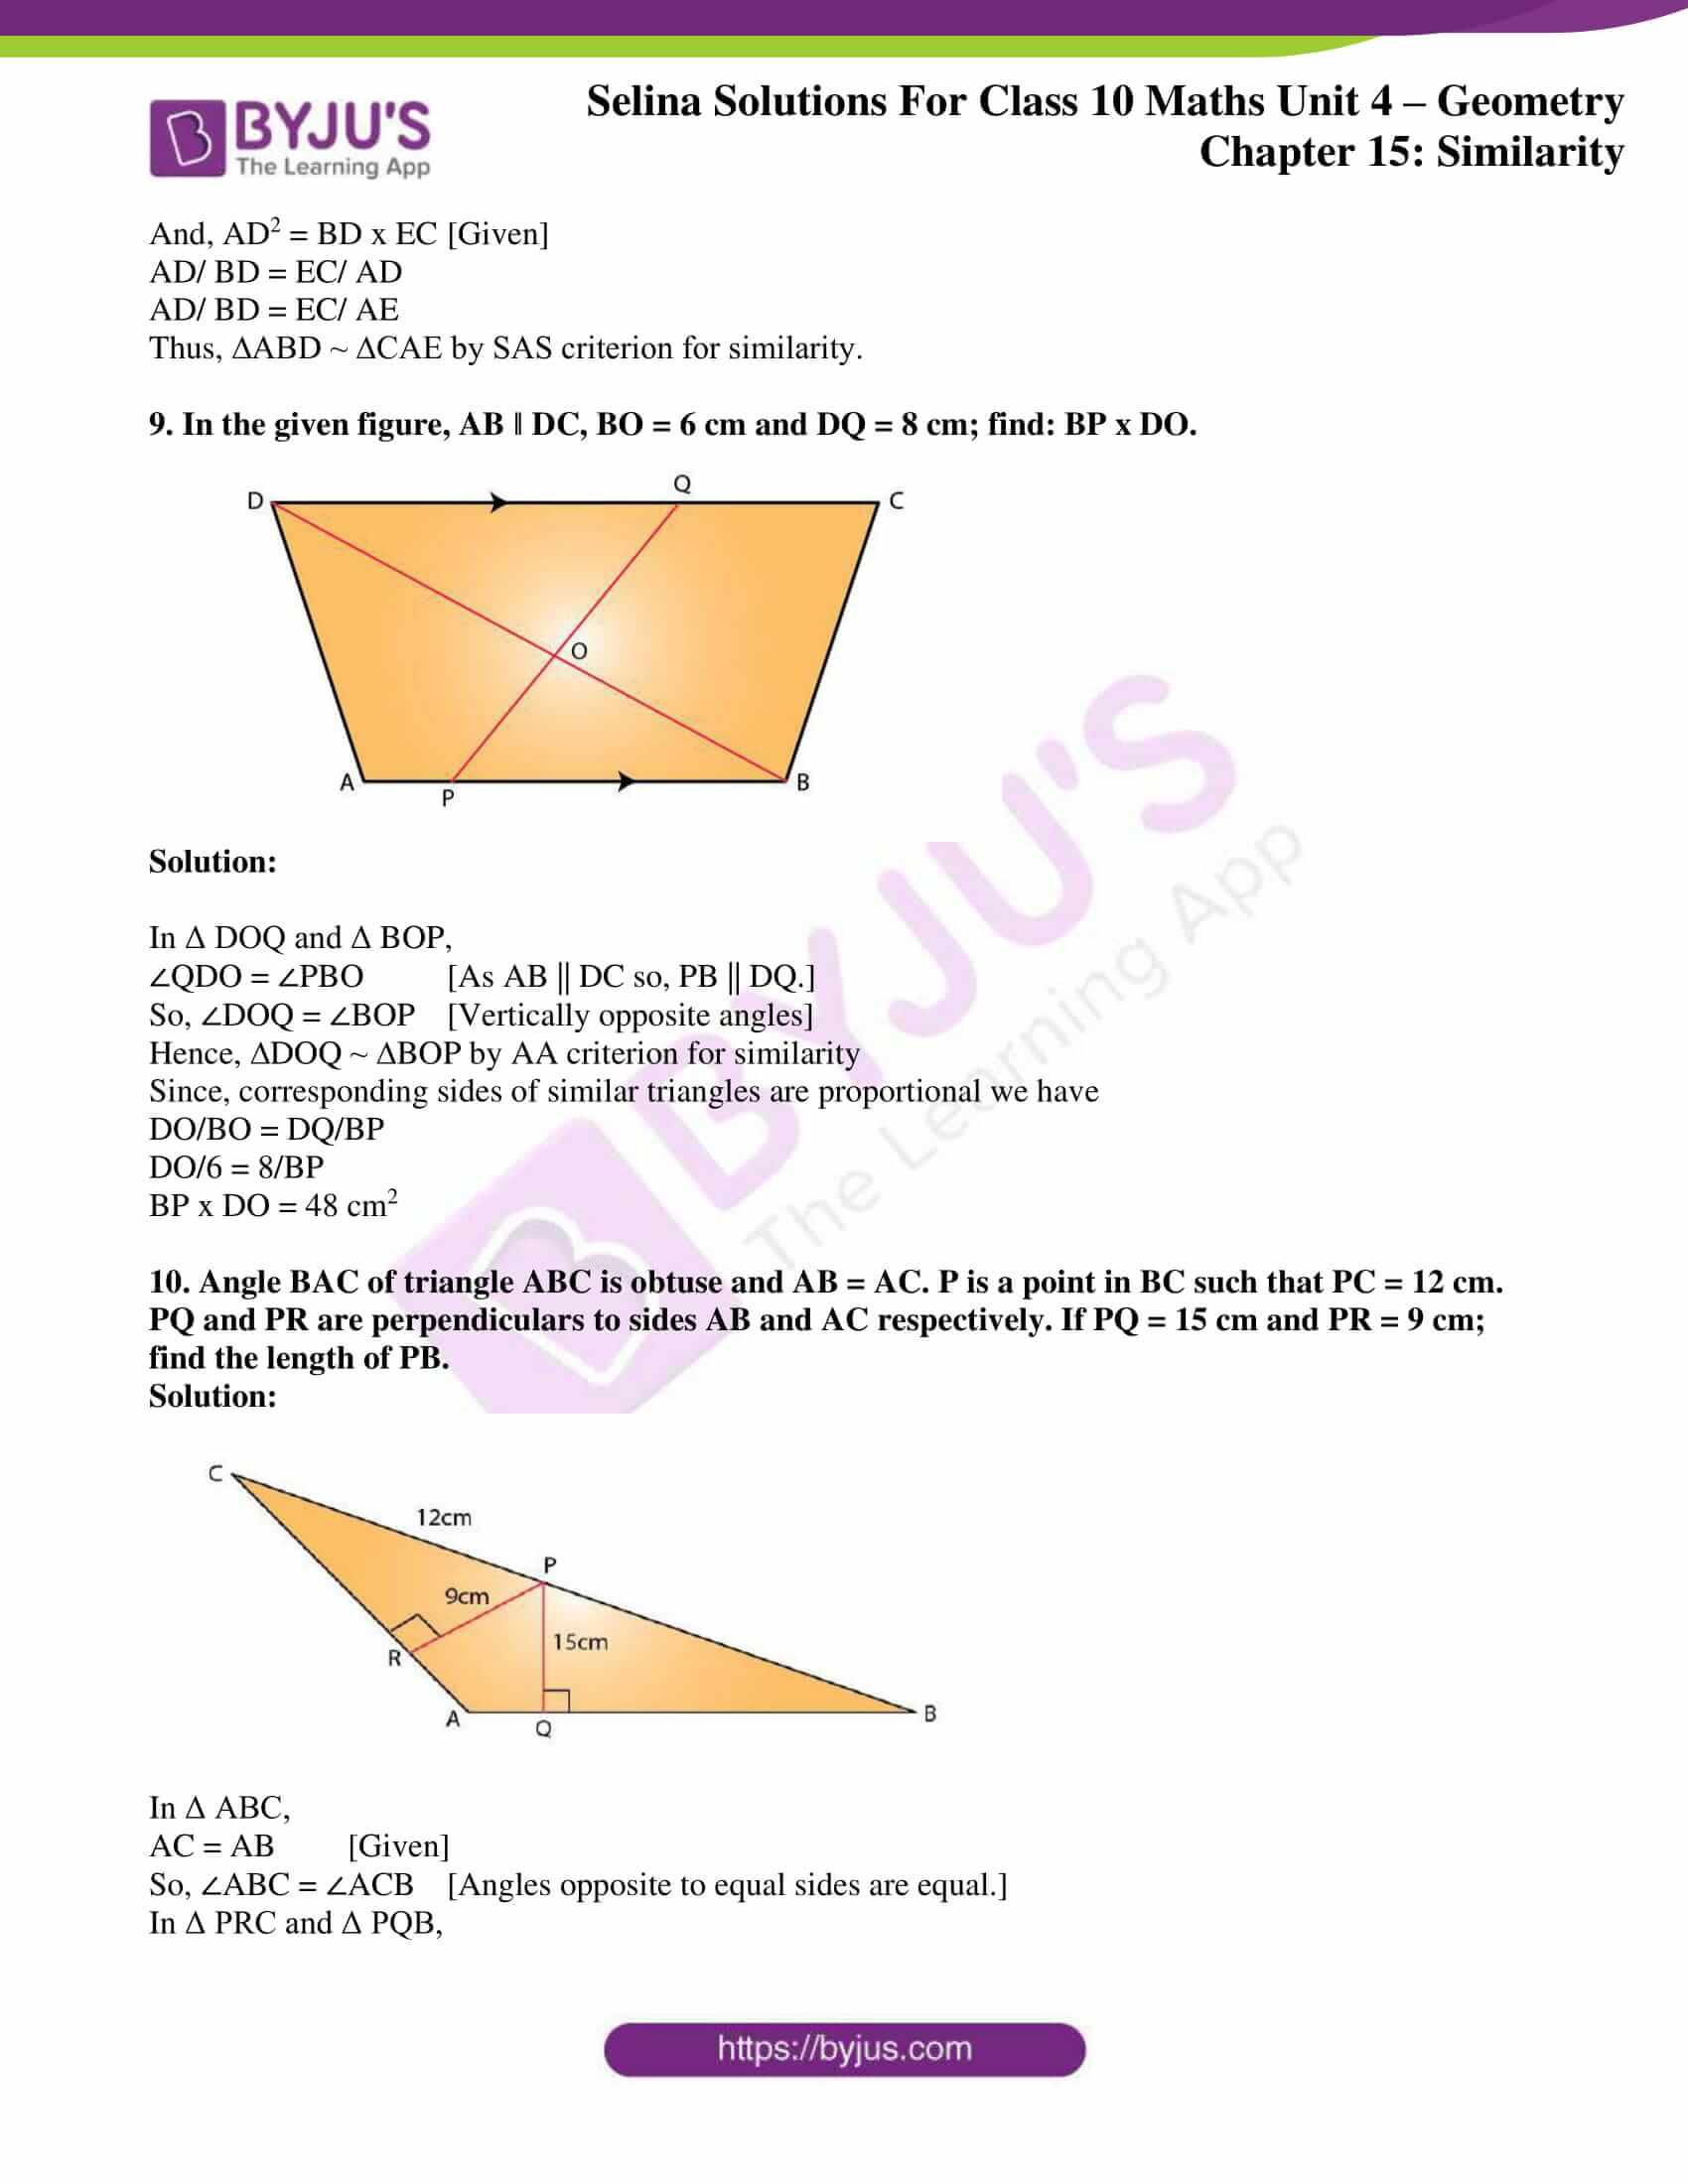 selina-sol-maths-class-10-ch-15-ex-a-6